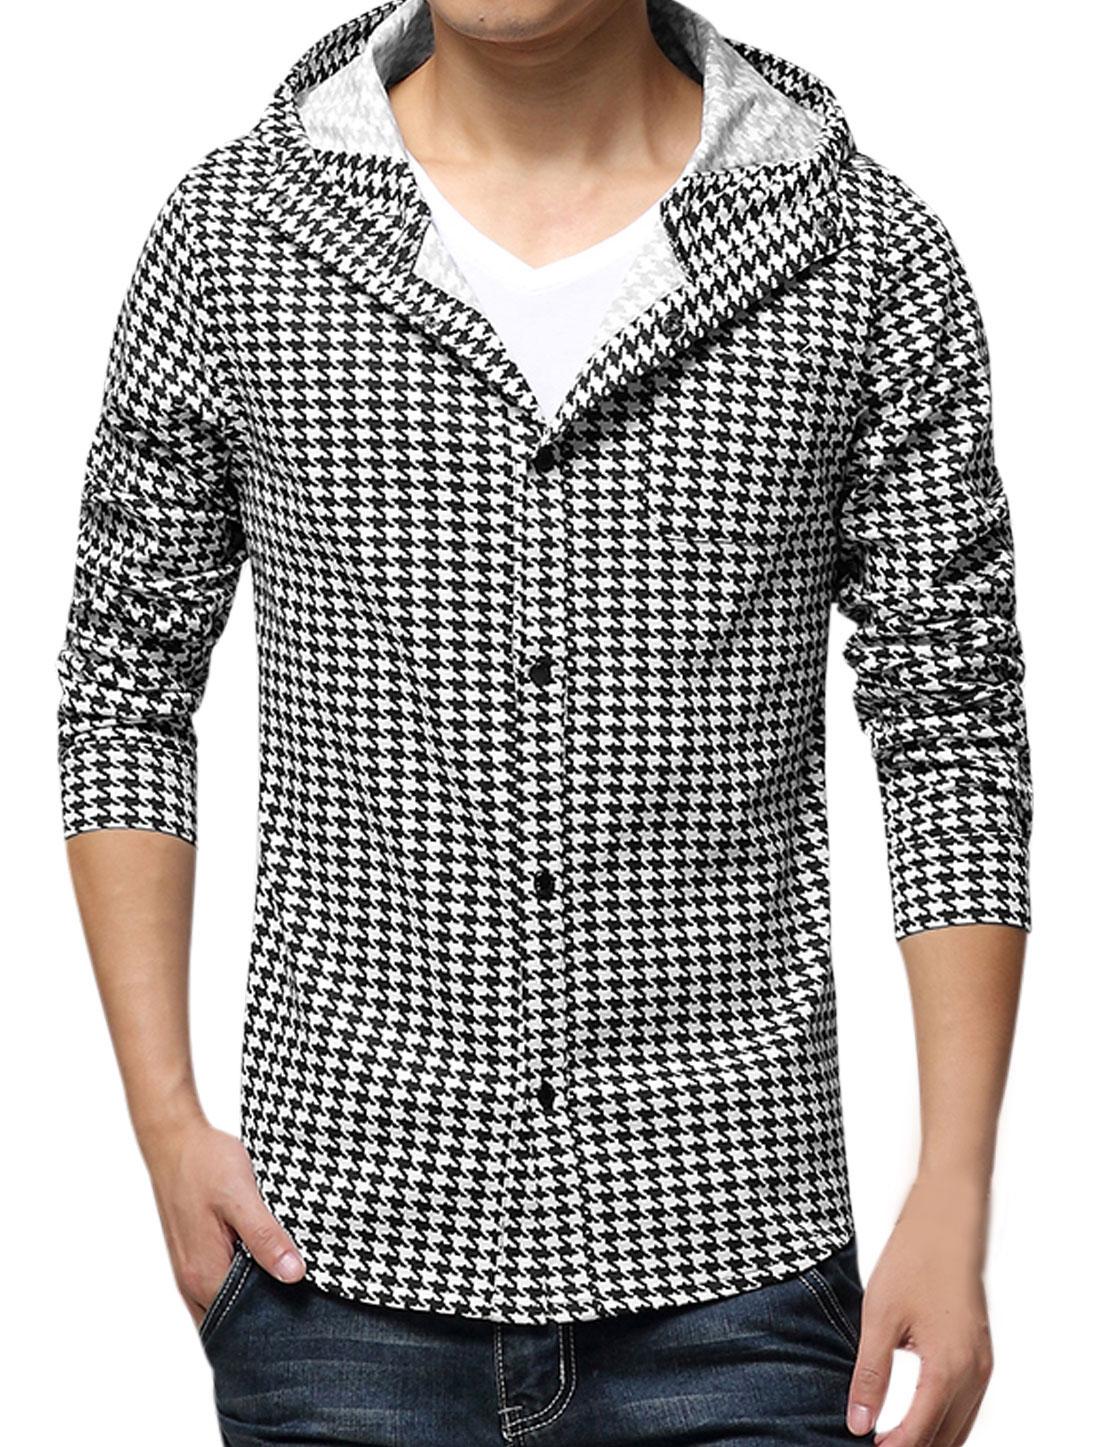 Men Houndstooth Pattern Hooded Long Sleeves Round Hem Jacket Black White S